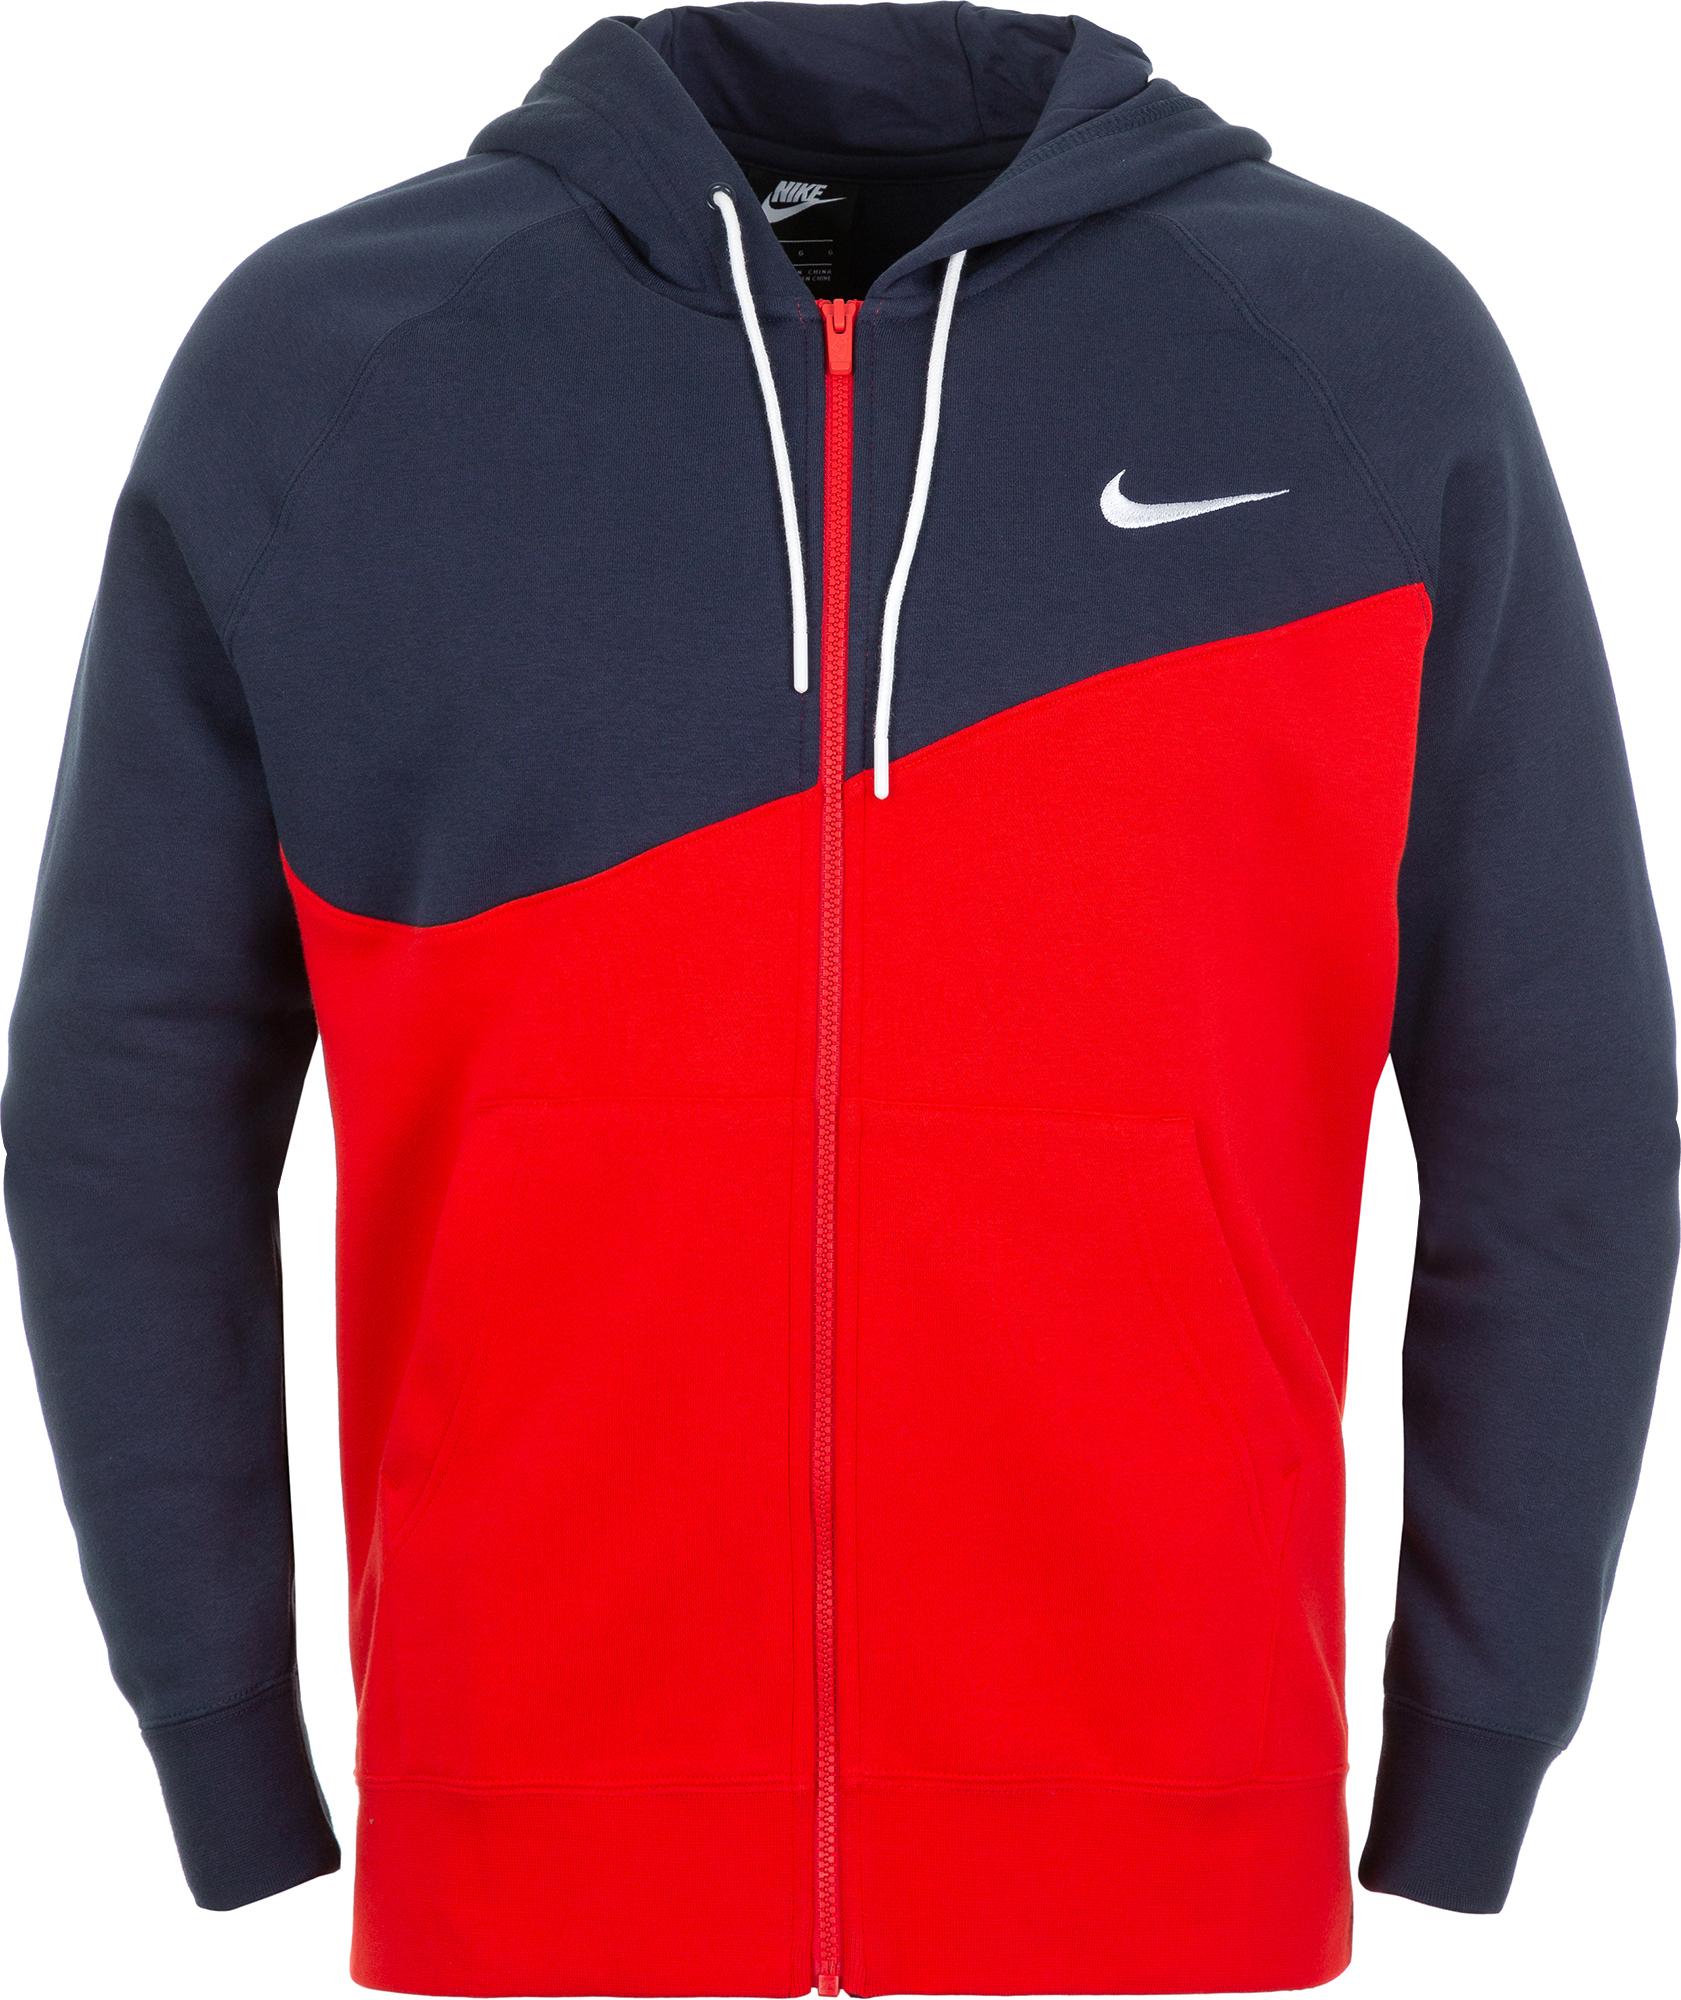 цена на Nike Толстовка мужская Nike Swoosh, размер 52-54